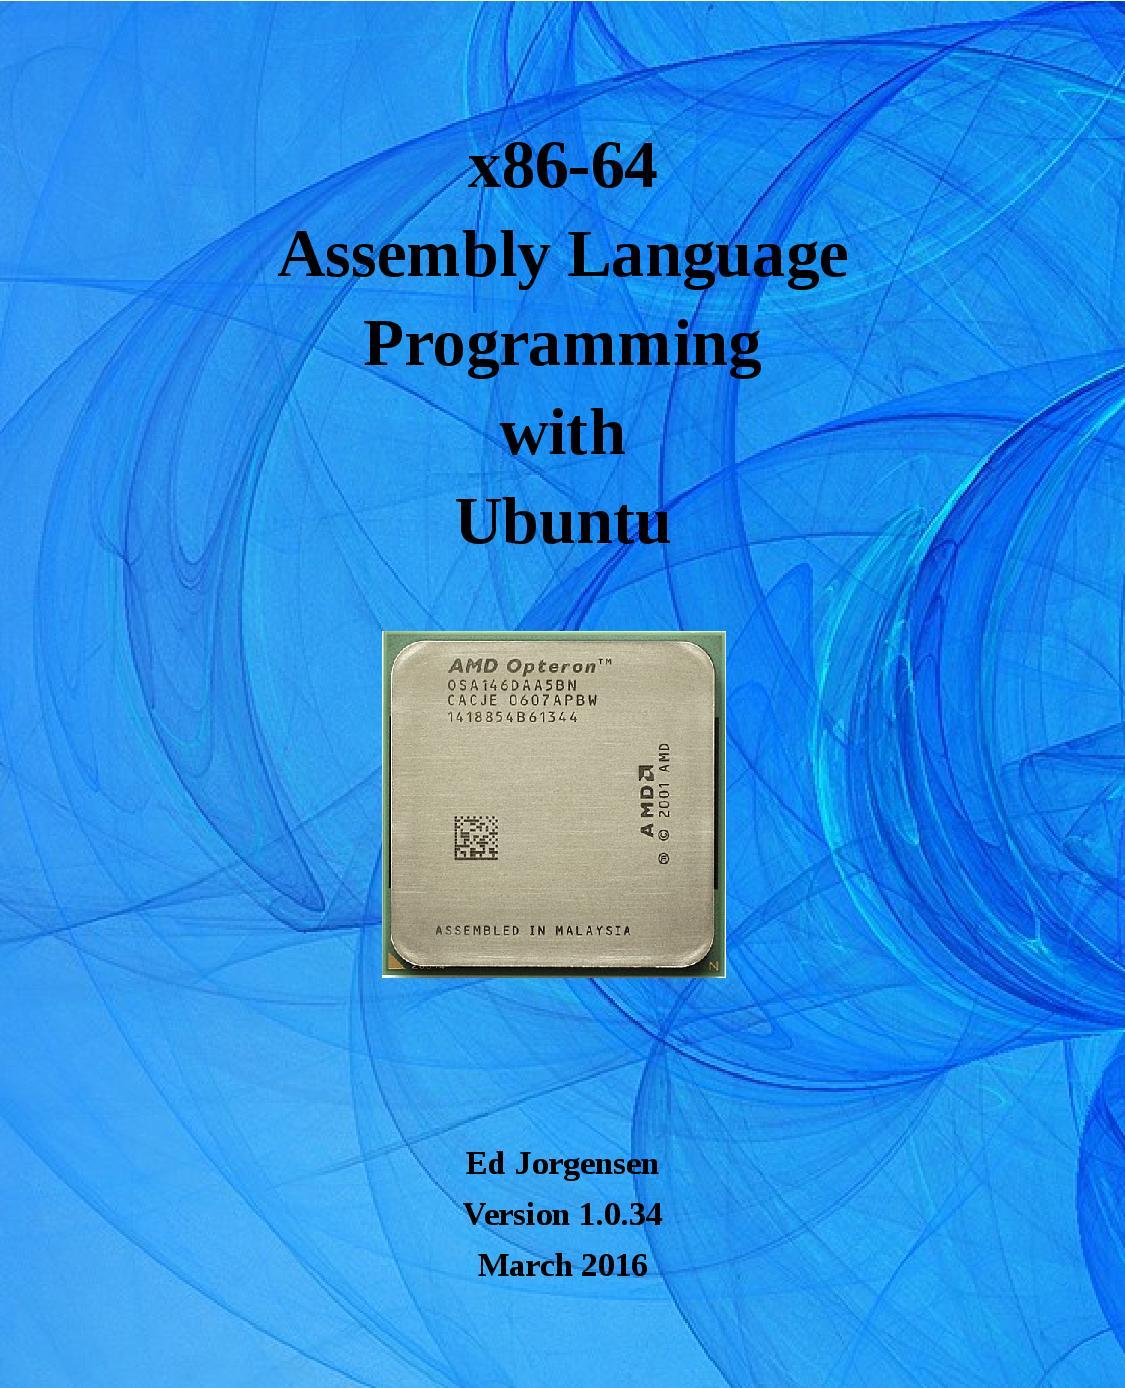 x86-64 Assembly Language Programming with Ubuntu